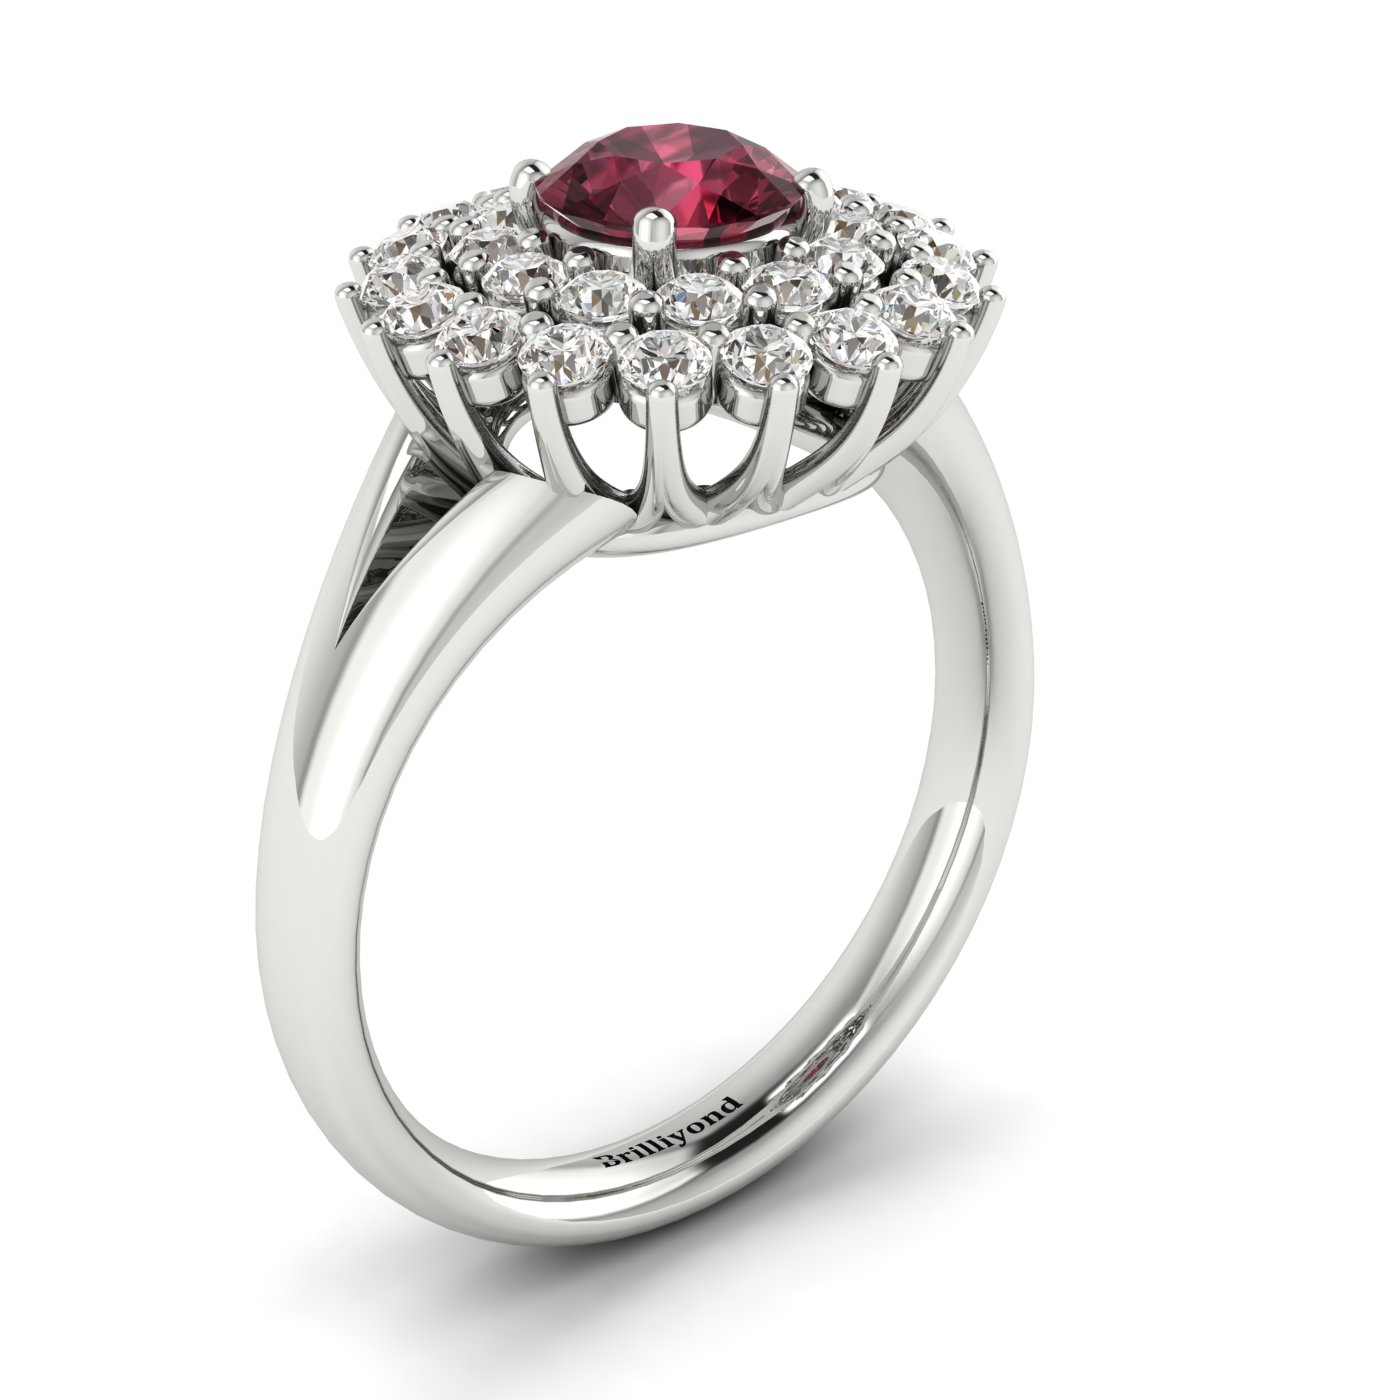 Garnet White Gold Cluster Engagement Ring Aquila_image2